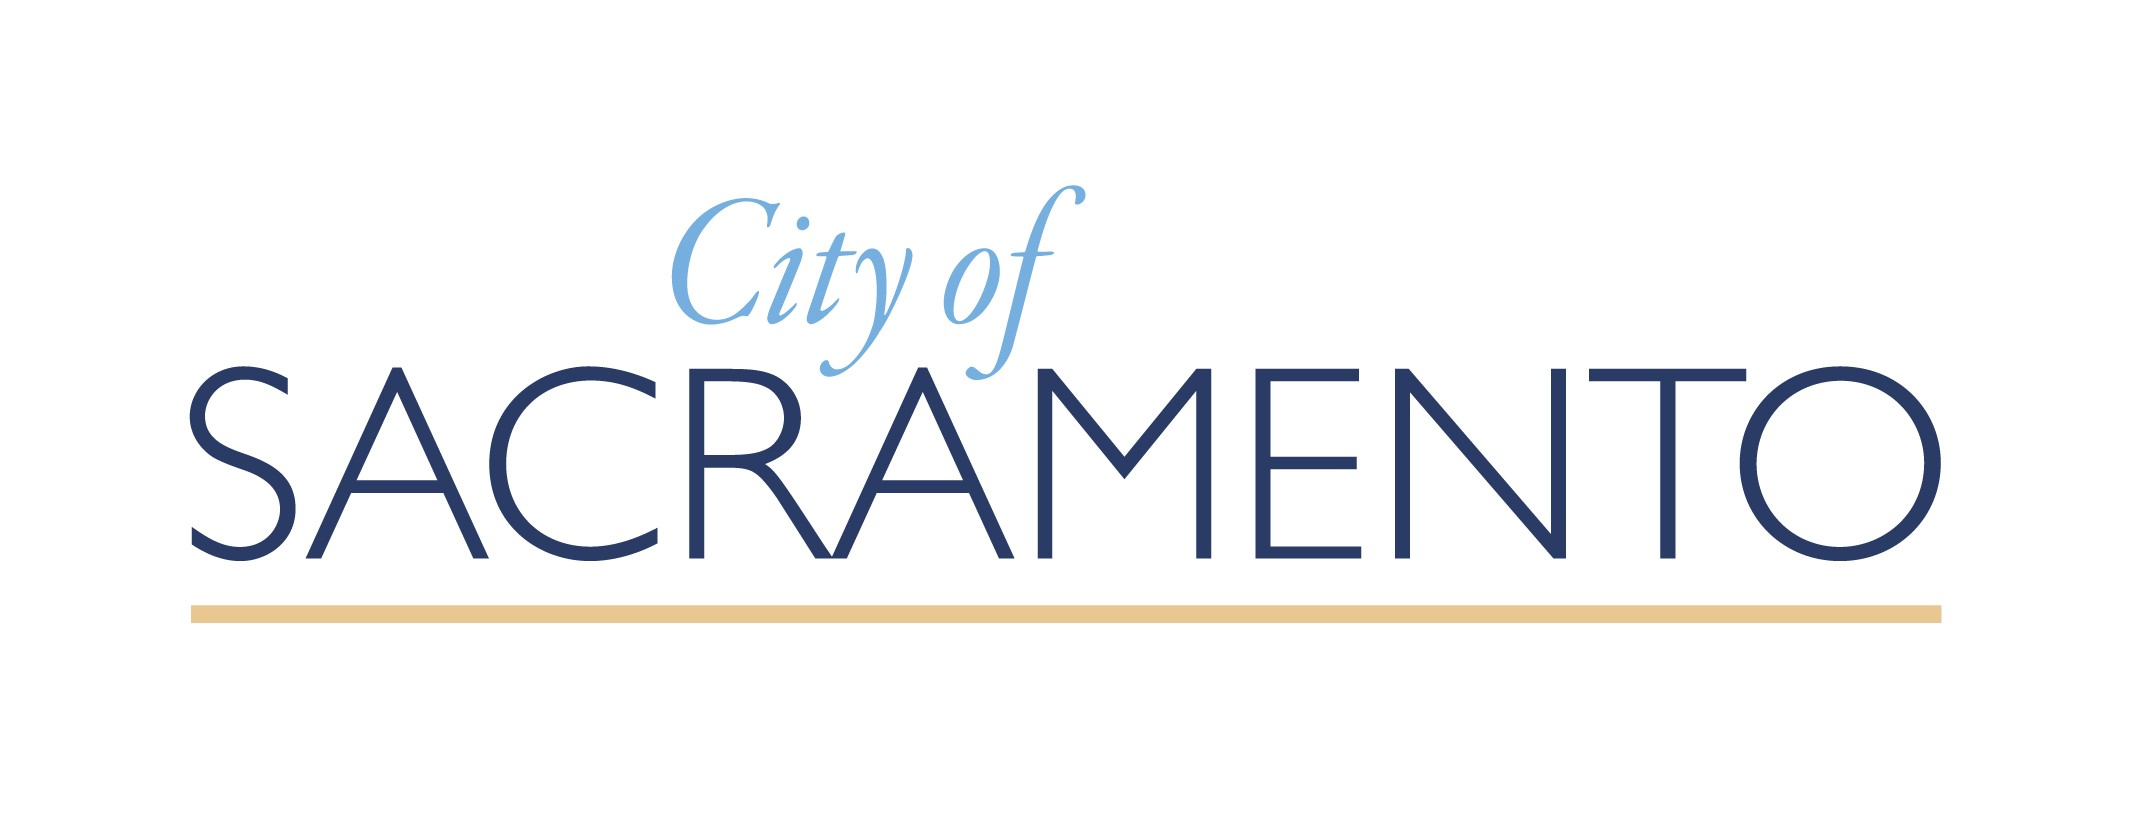 Tales of Savings: City of Sacramento uses NPPGov for ProForce Purchase